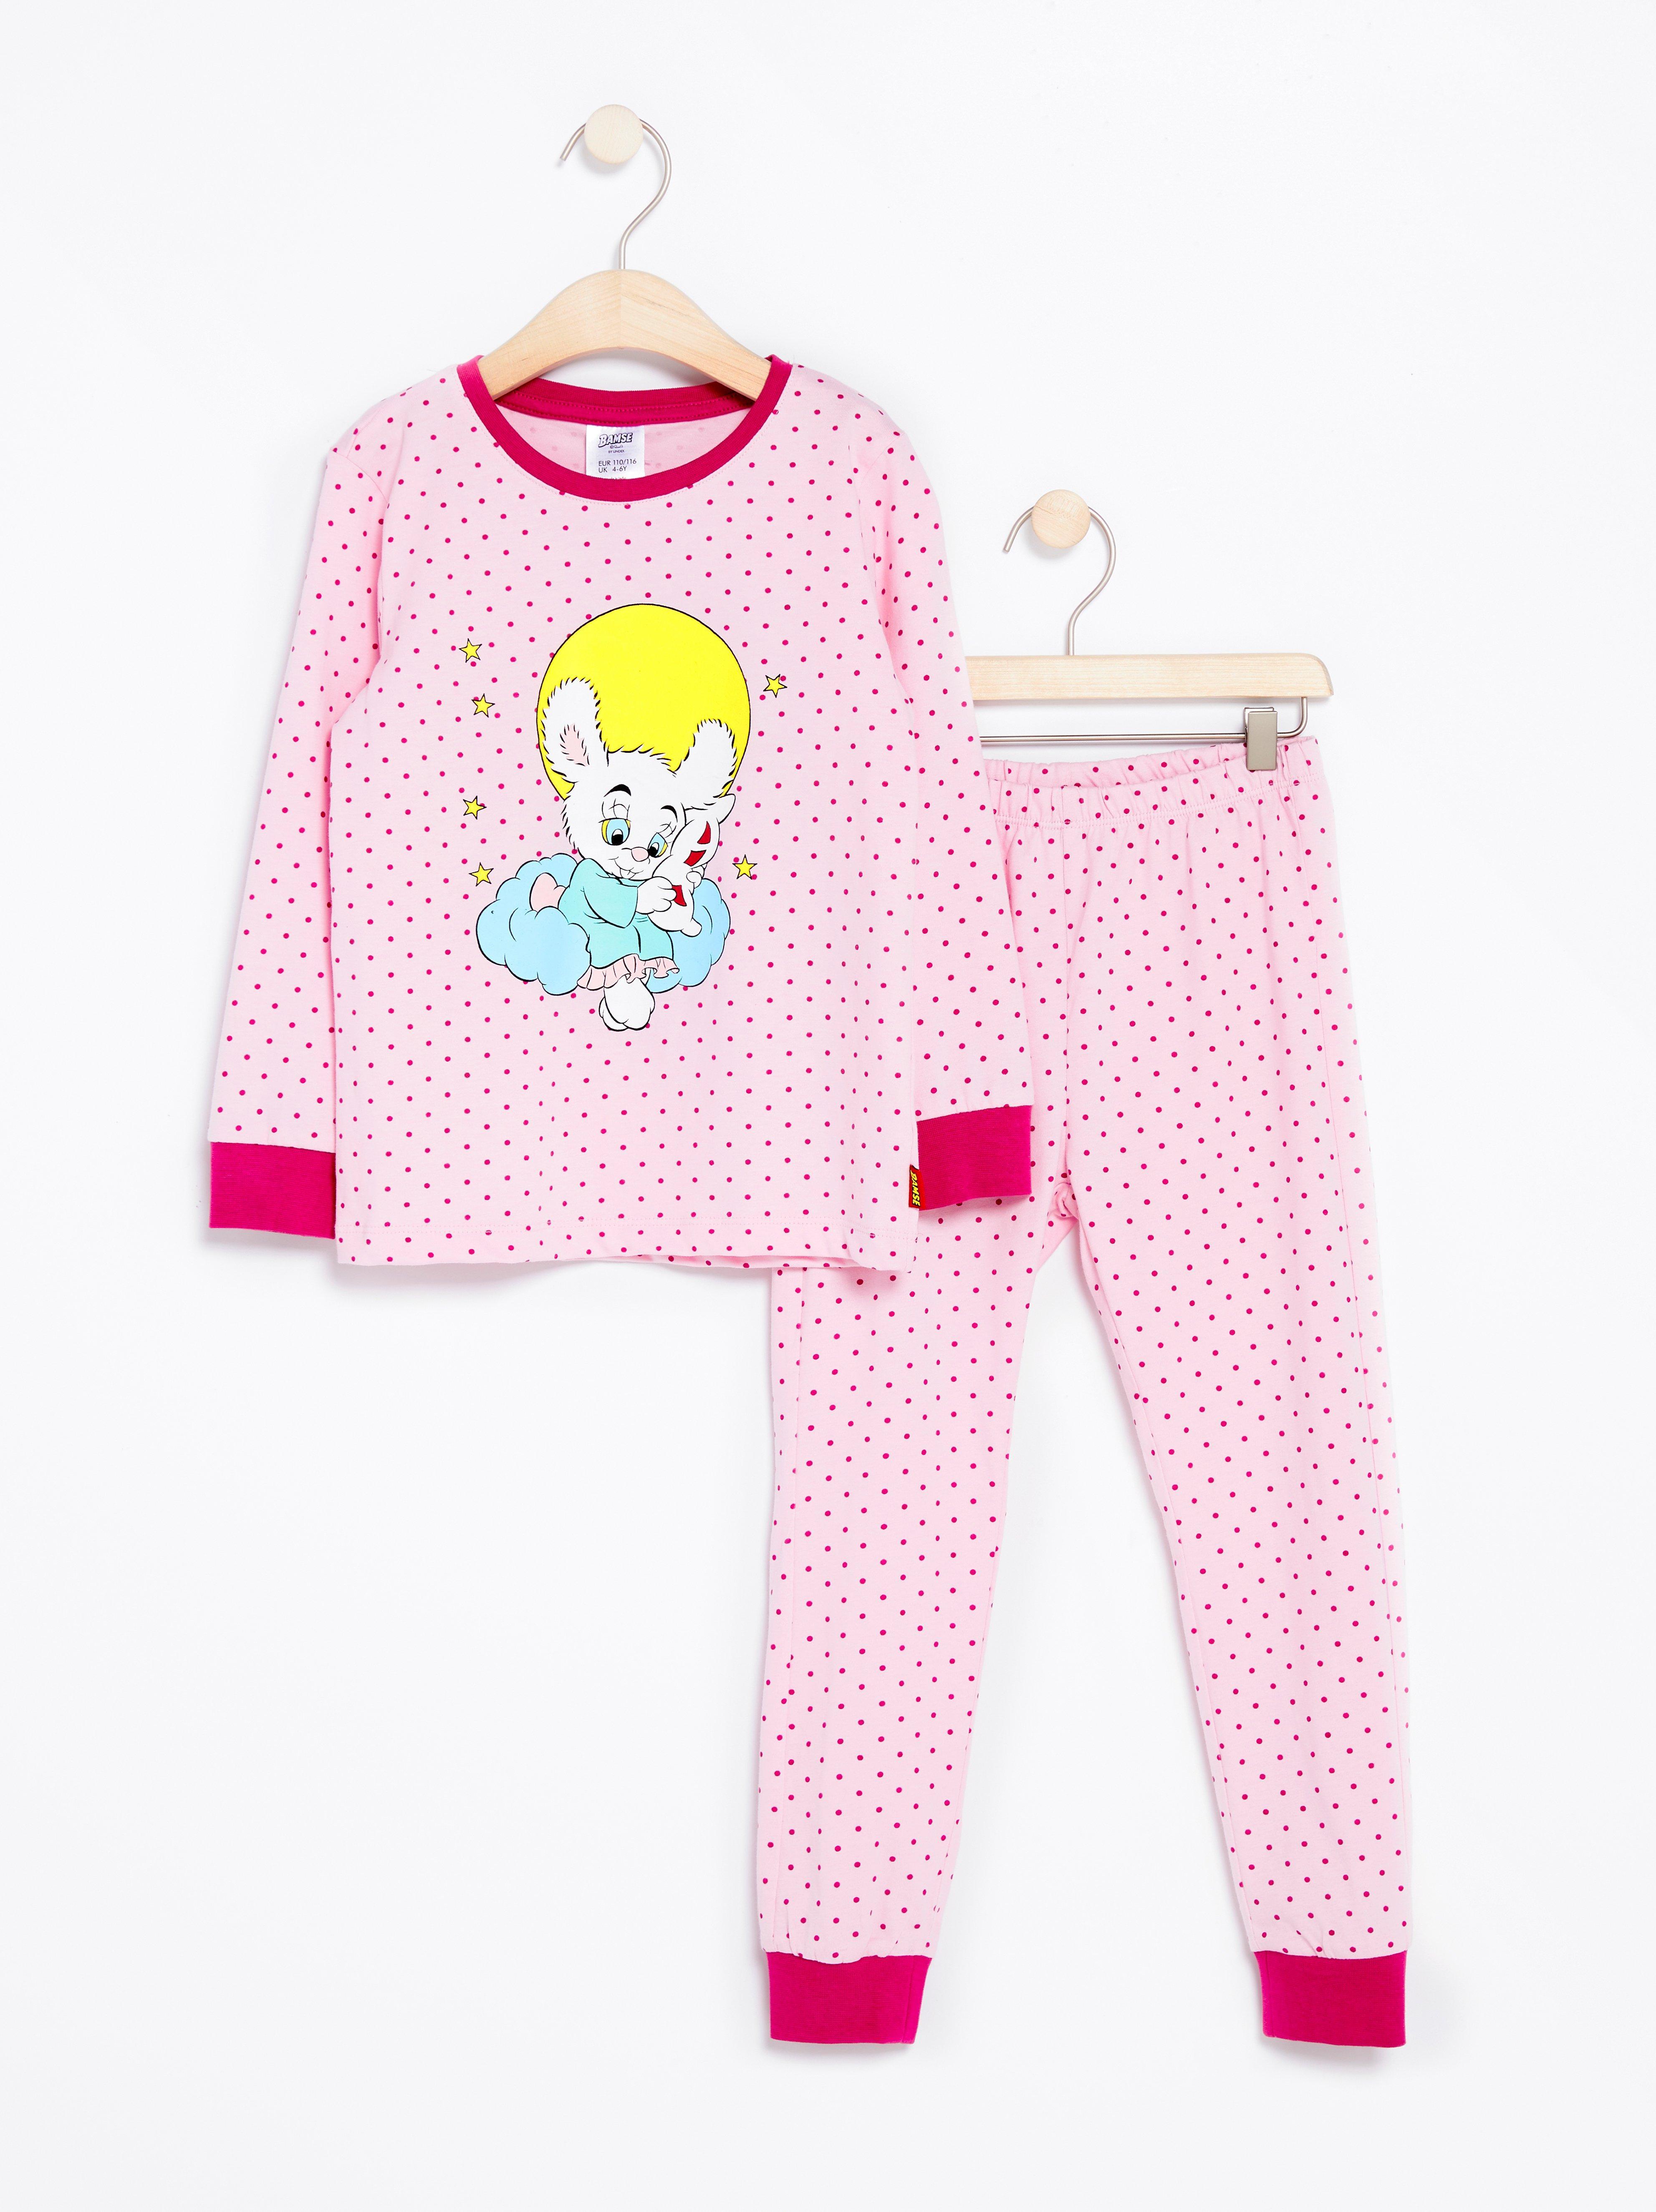 Pyjamas med Bamse-tryck Lindex - Shoppa idag d9319a8282b6b